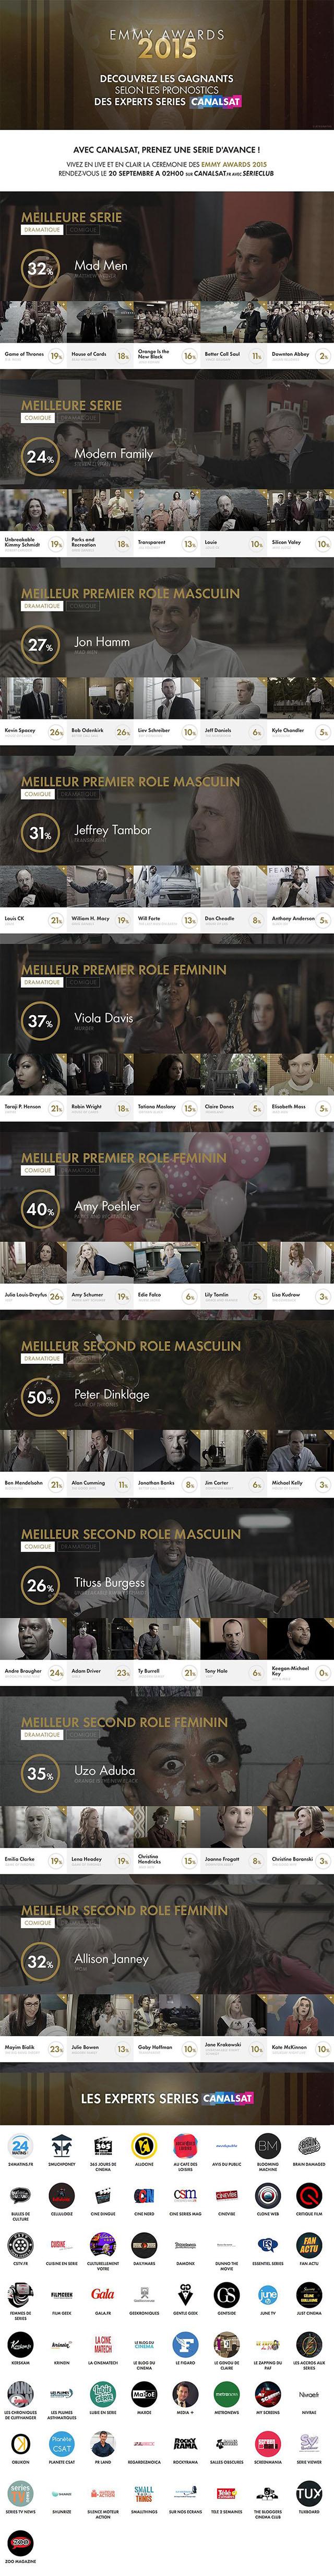 Emmy Awards 2015 : les principales nominations et les pronostics